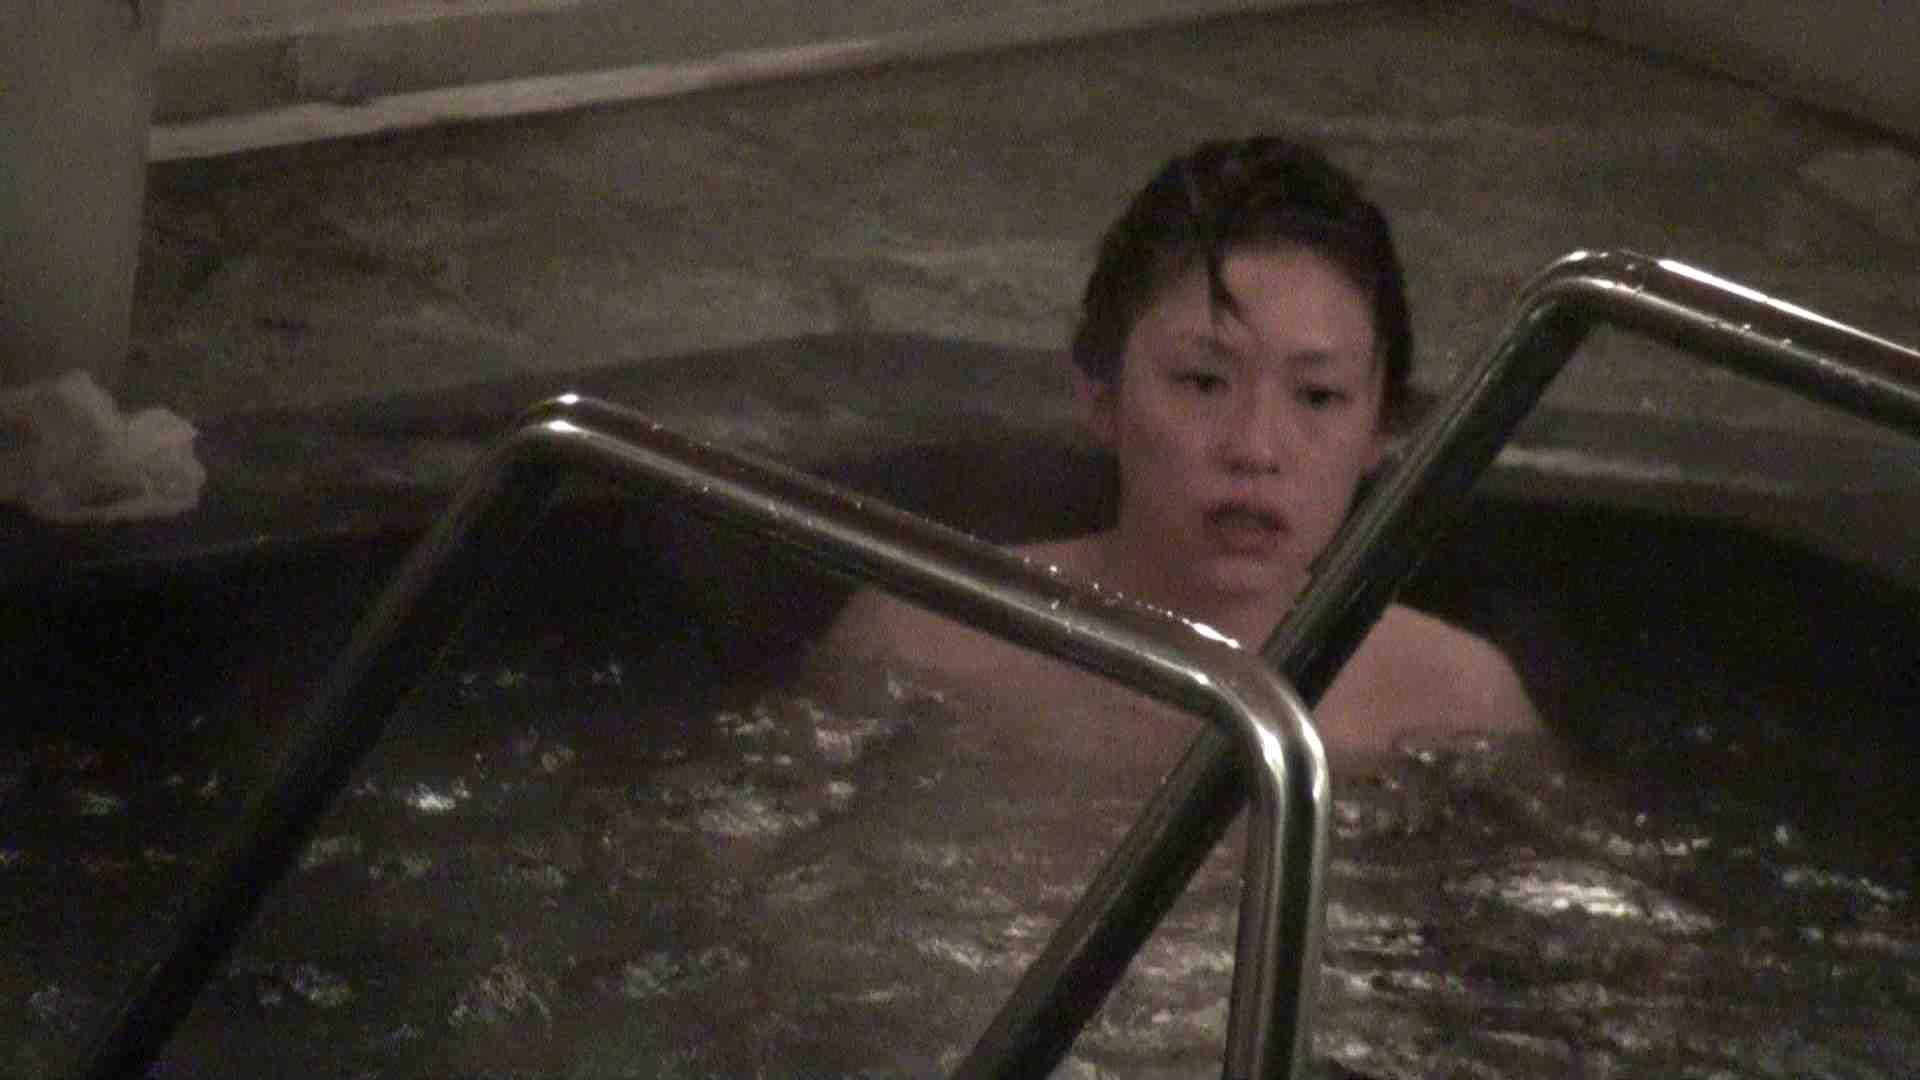 Aquaな露天風呂Vol.434 0  81連発 24